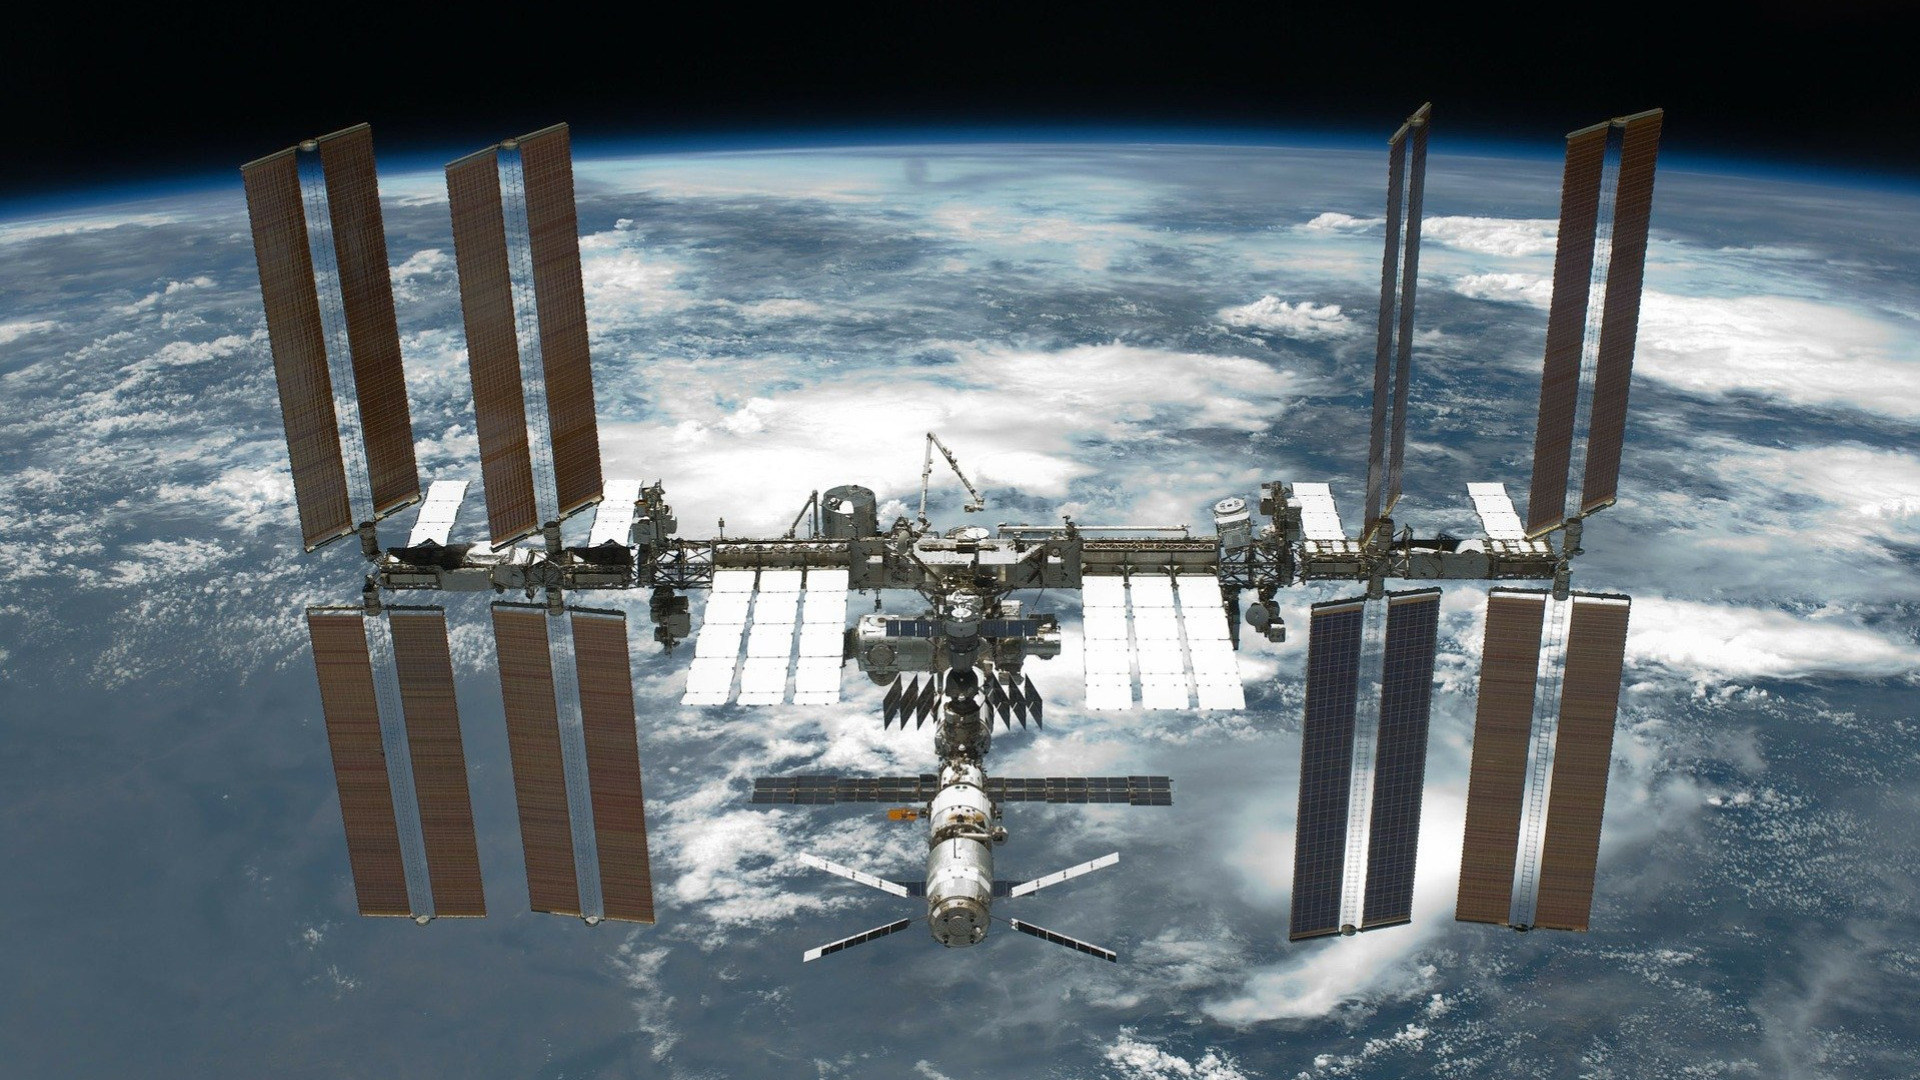 Nasa, Iss, Raumstation, International Space Station, internationale Raumstation